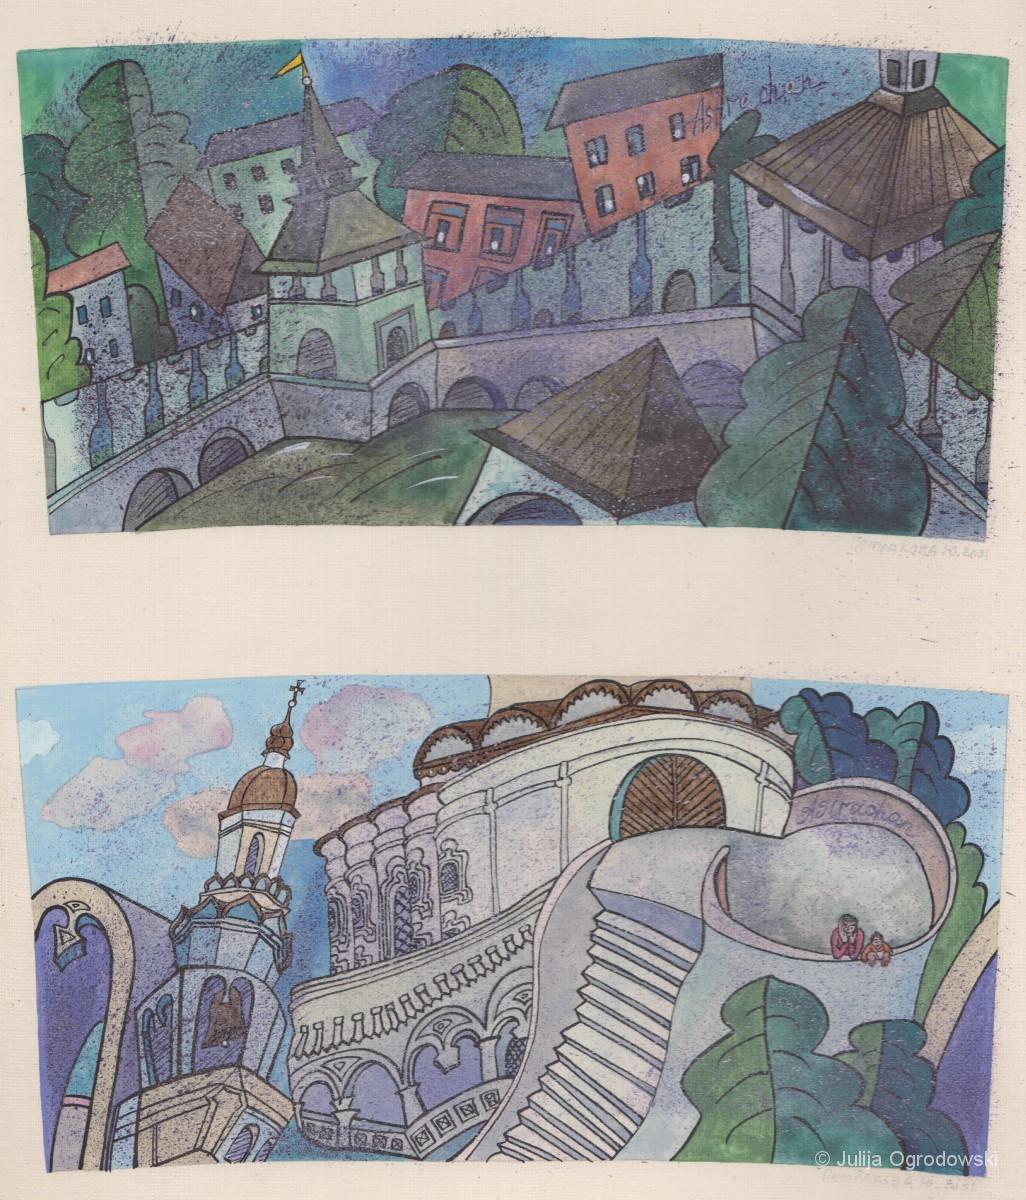 Astrachan - Julija Ogrodowski